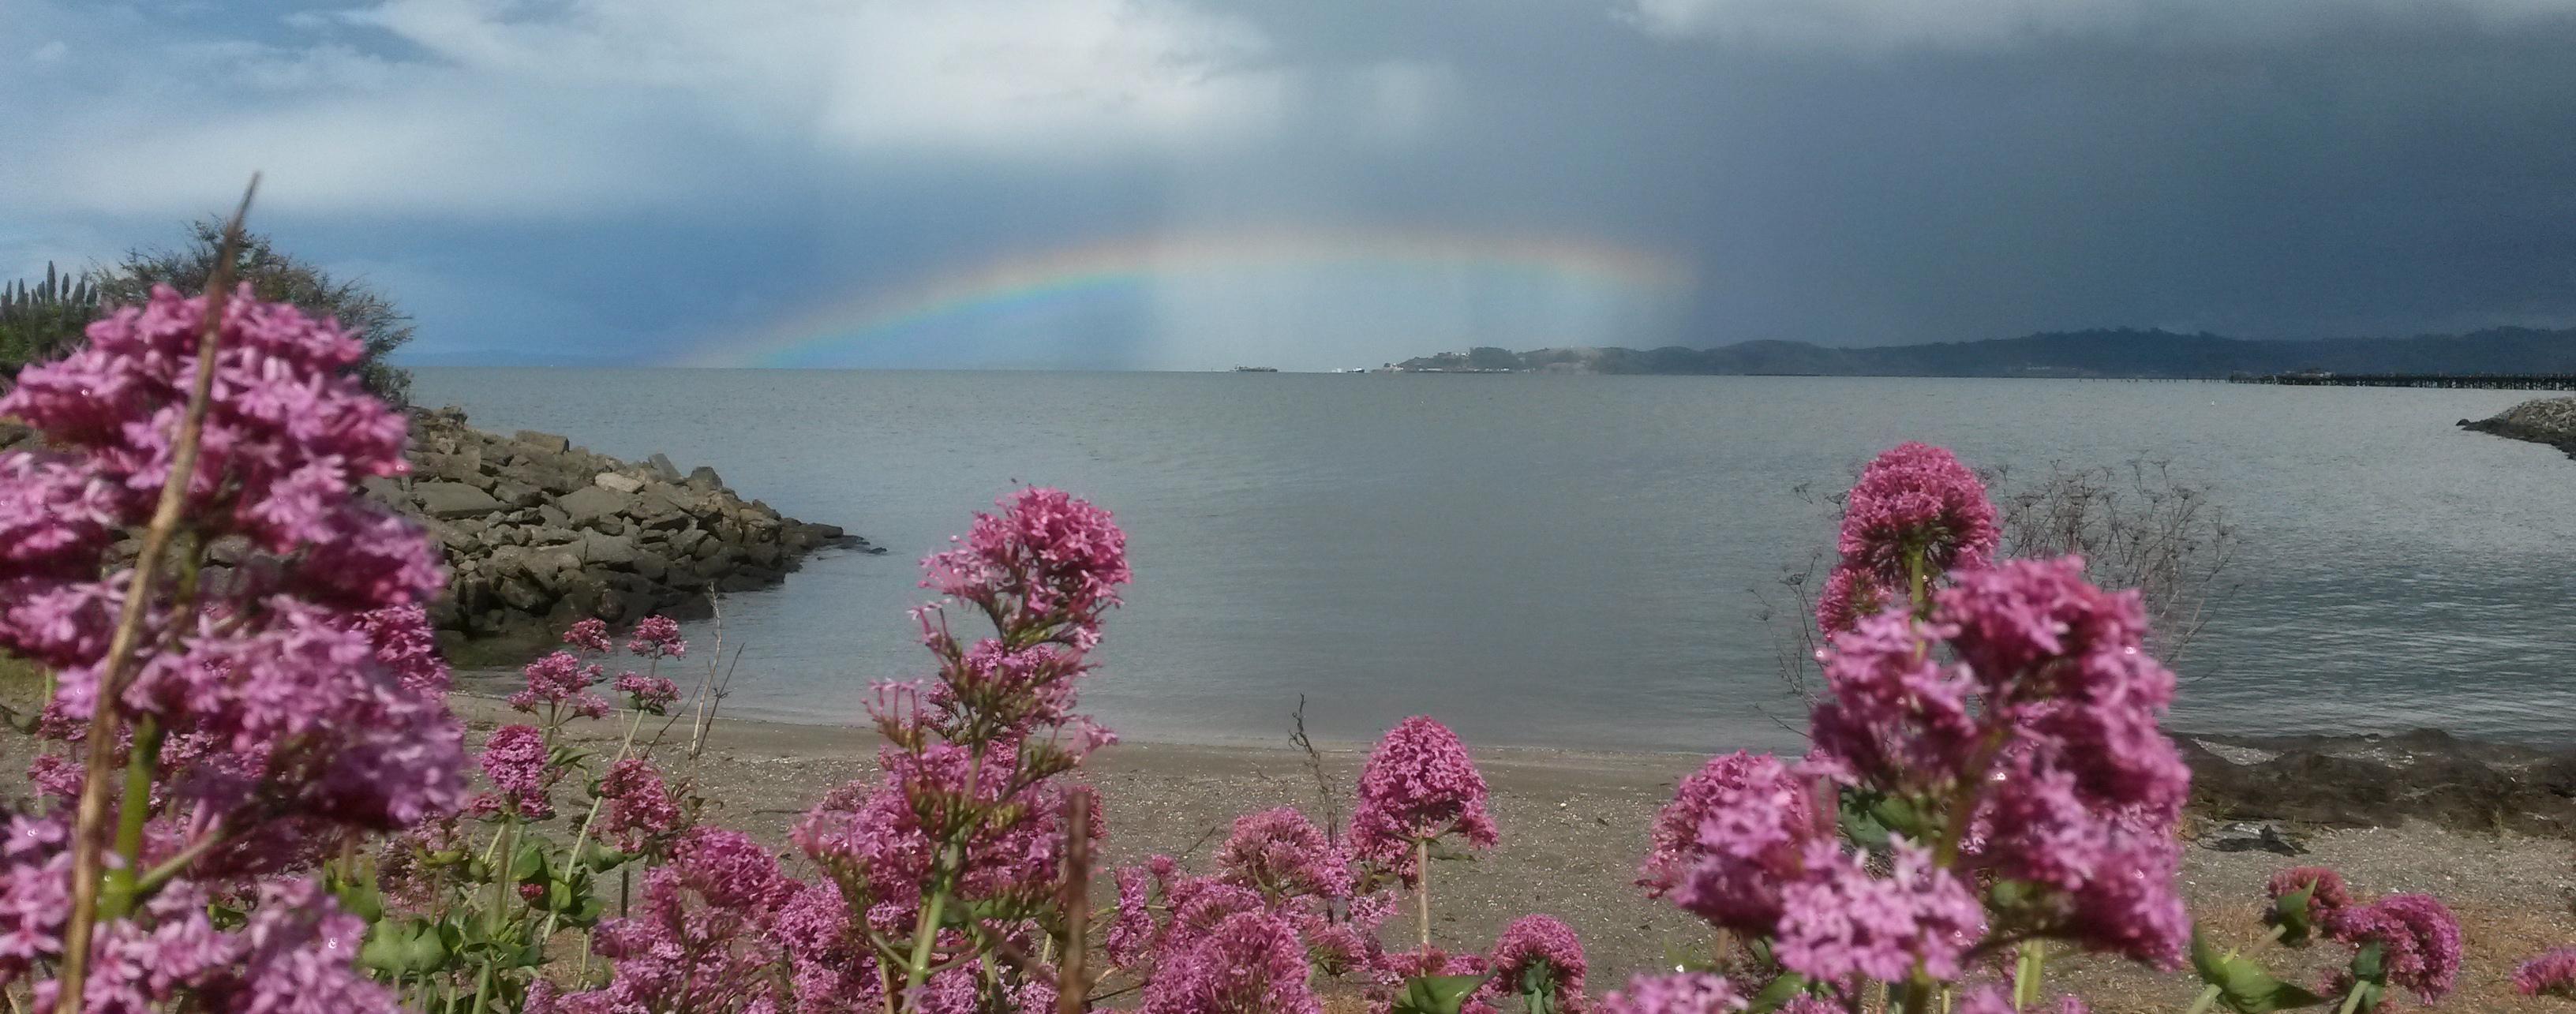 Stetson San Rafael Rainbow View